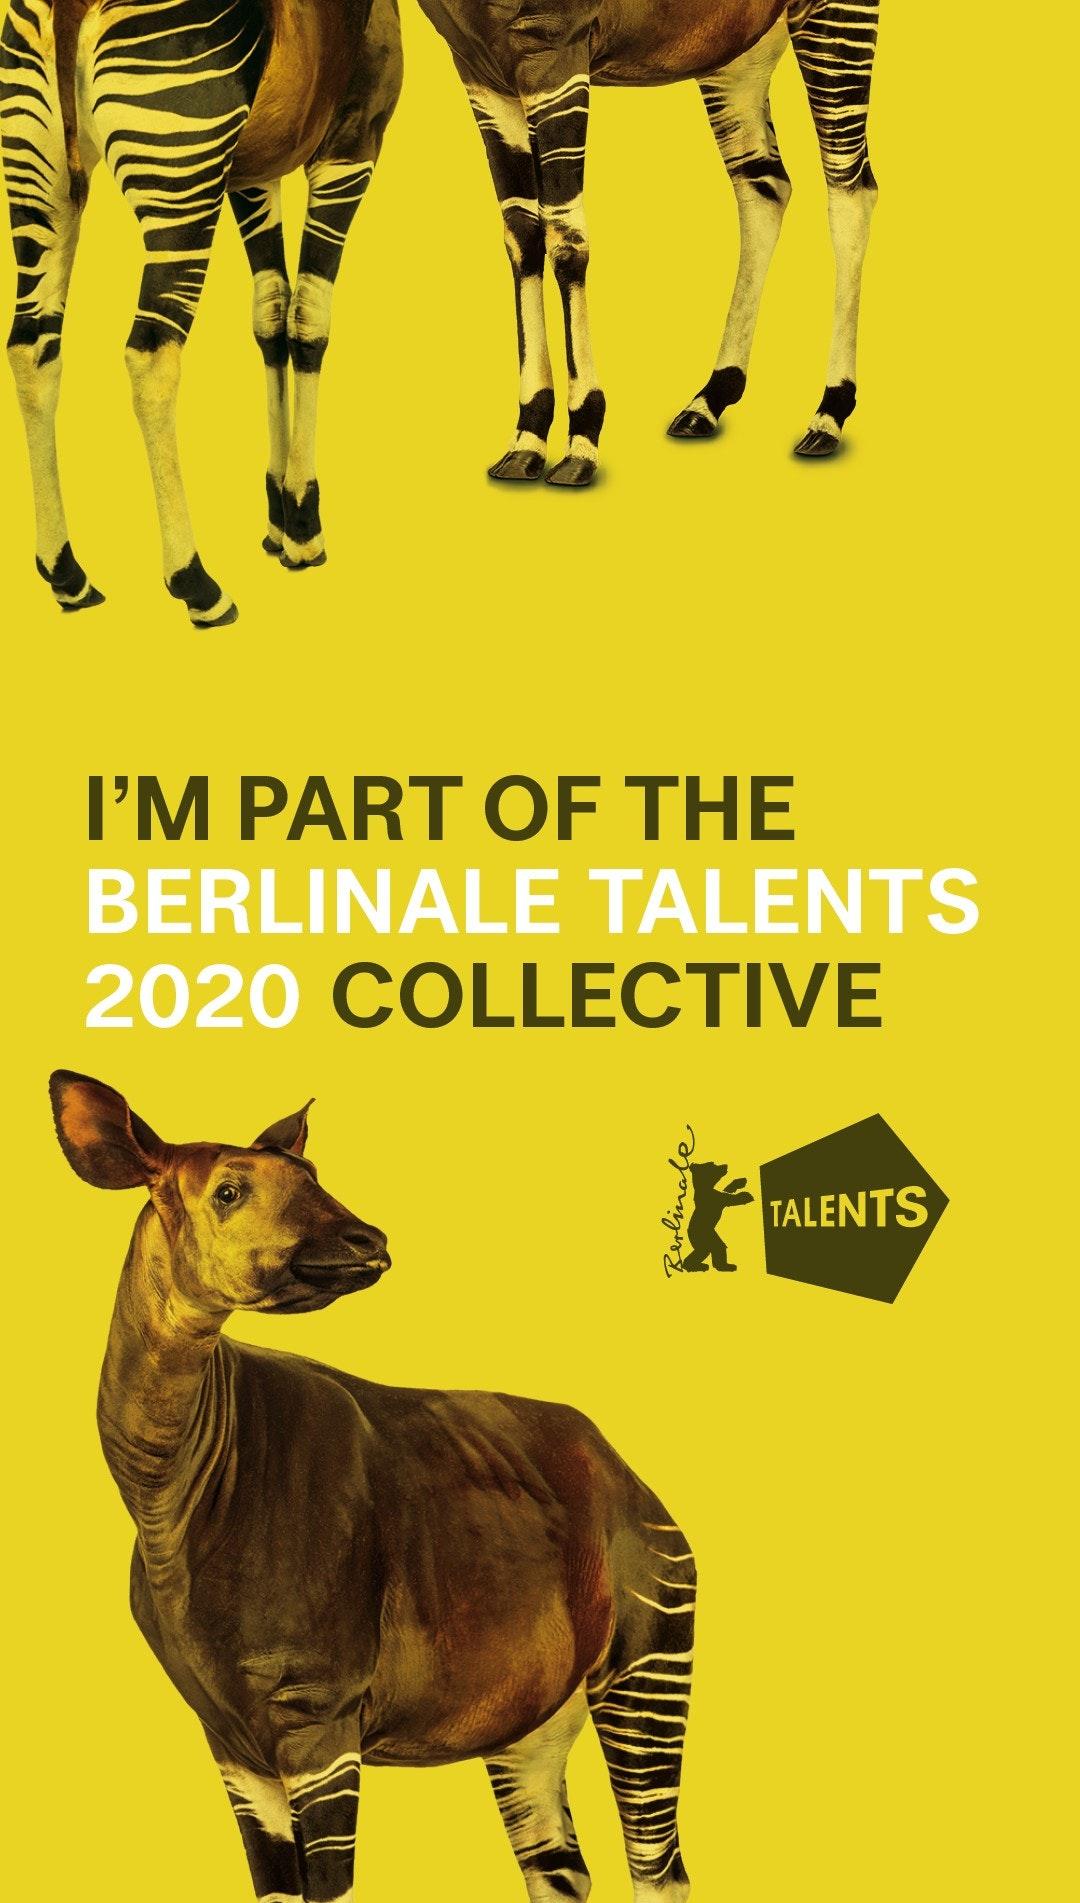 I'm a 2020 Berlinale Talent!